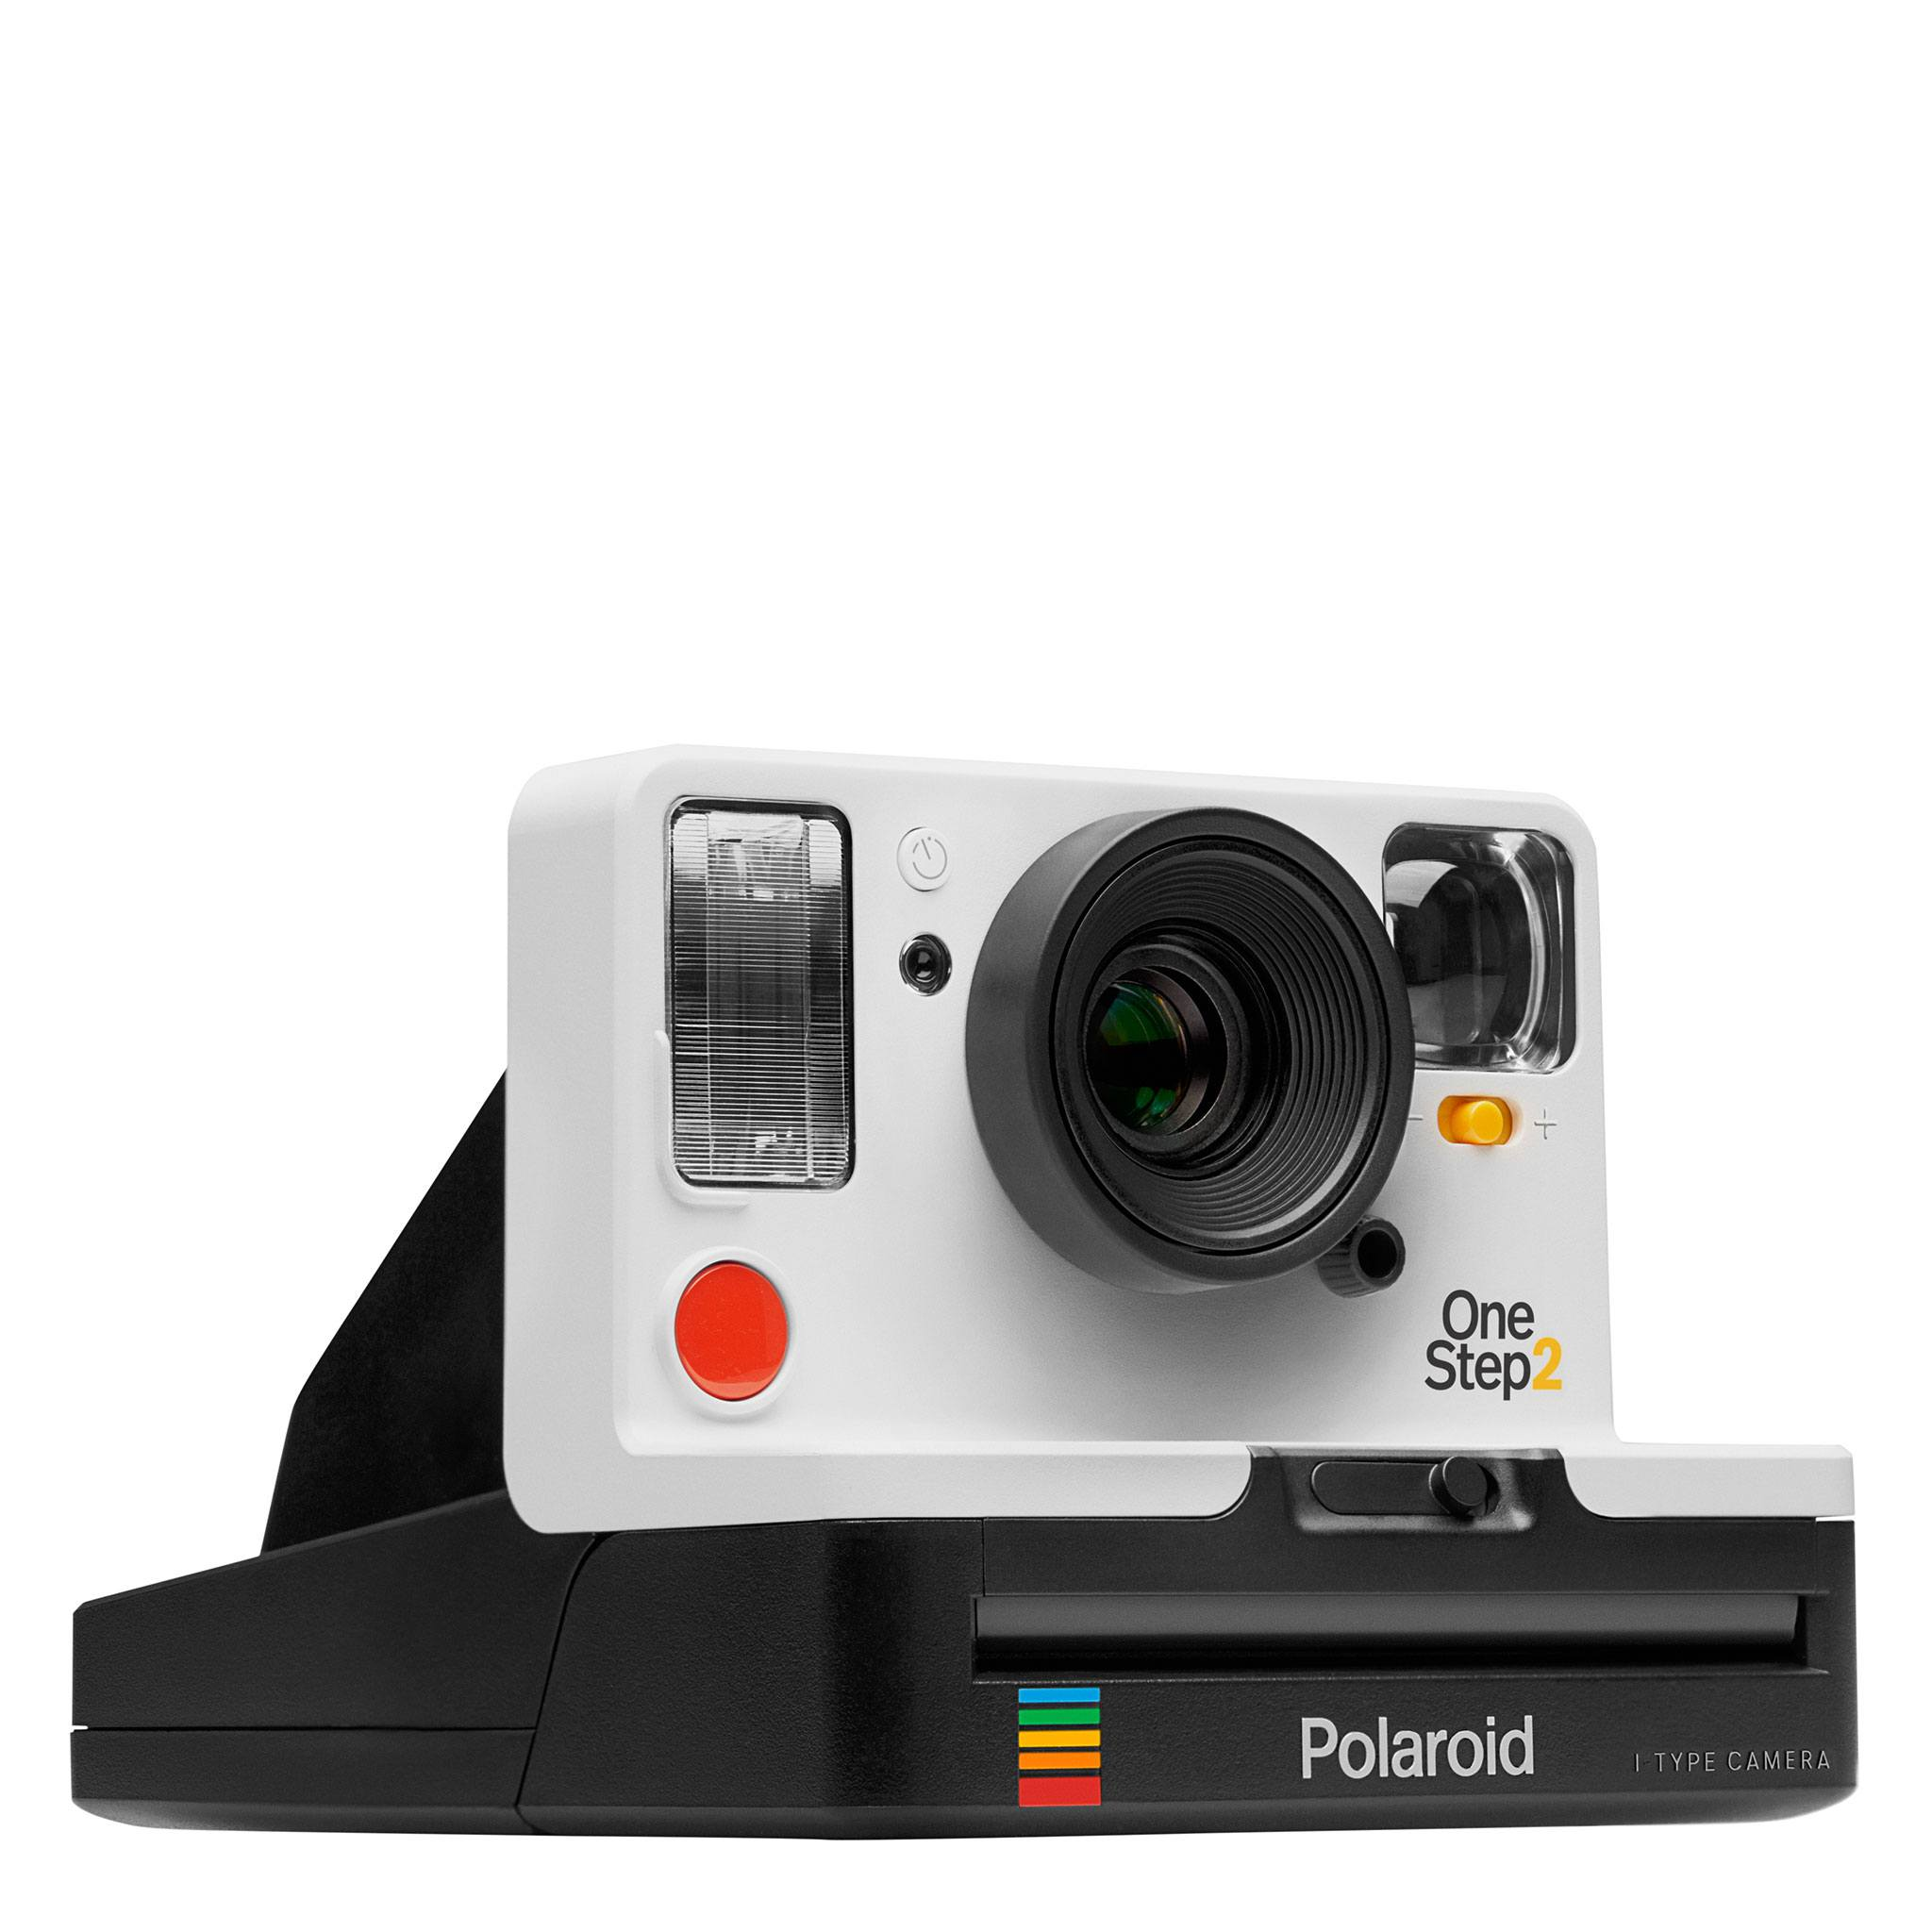 white-onestep2-polaroid-camera-009003-angle.jpg